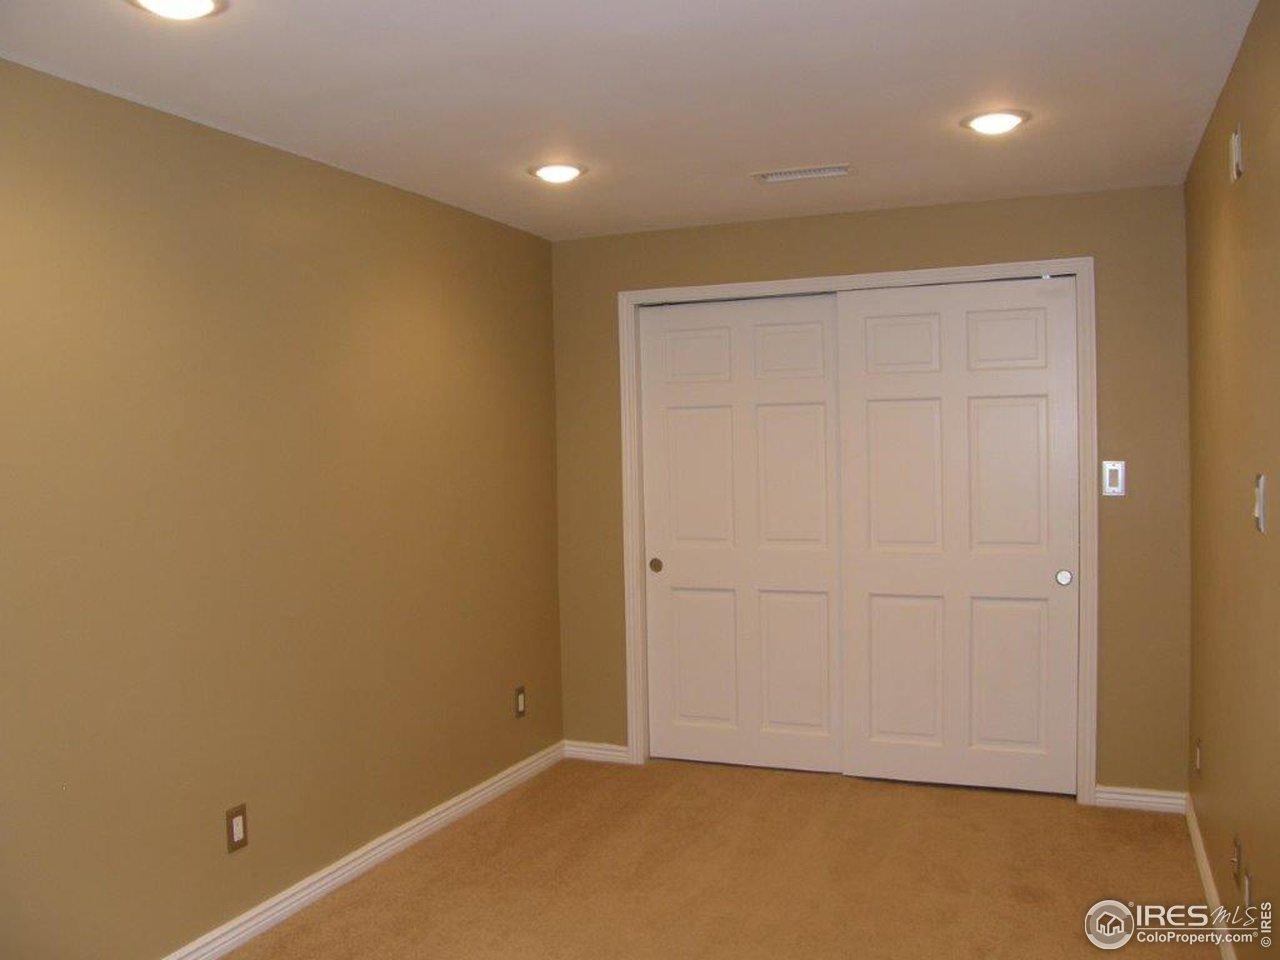 Bedroom 4 in basmt